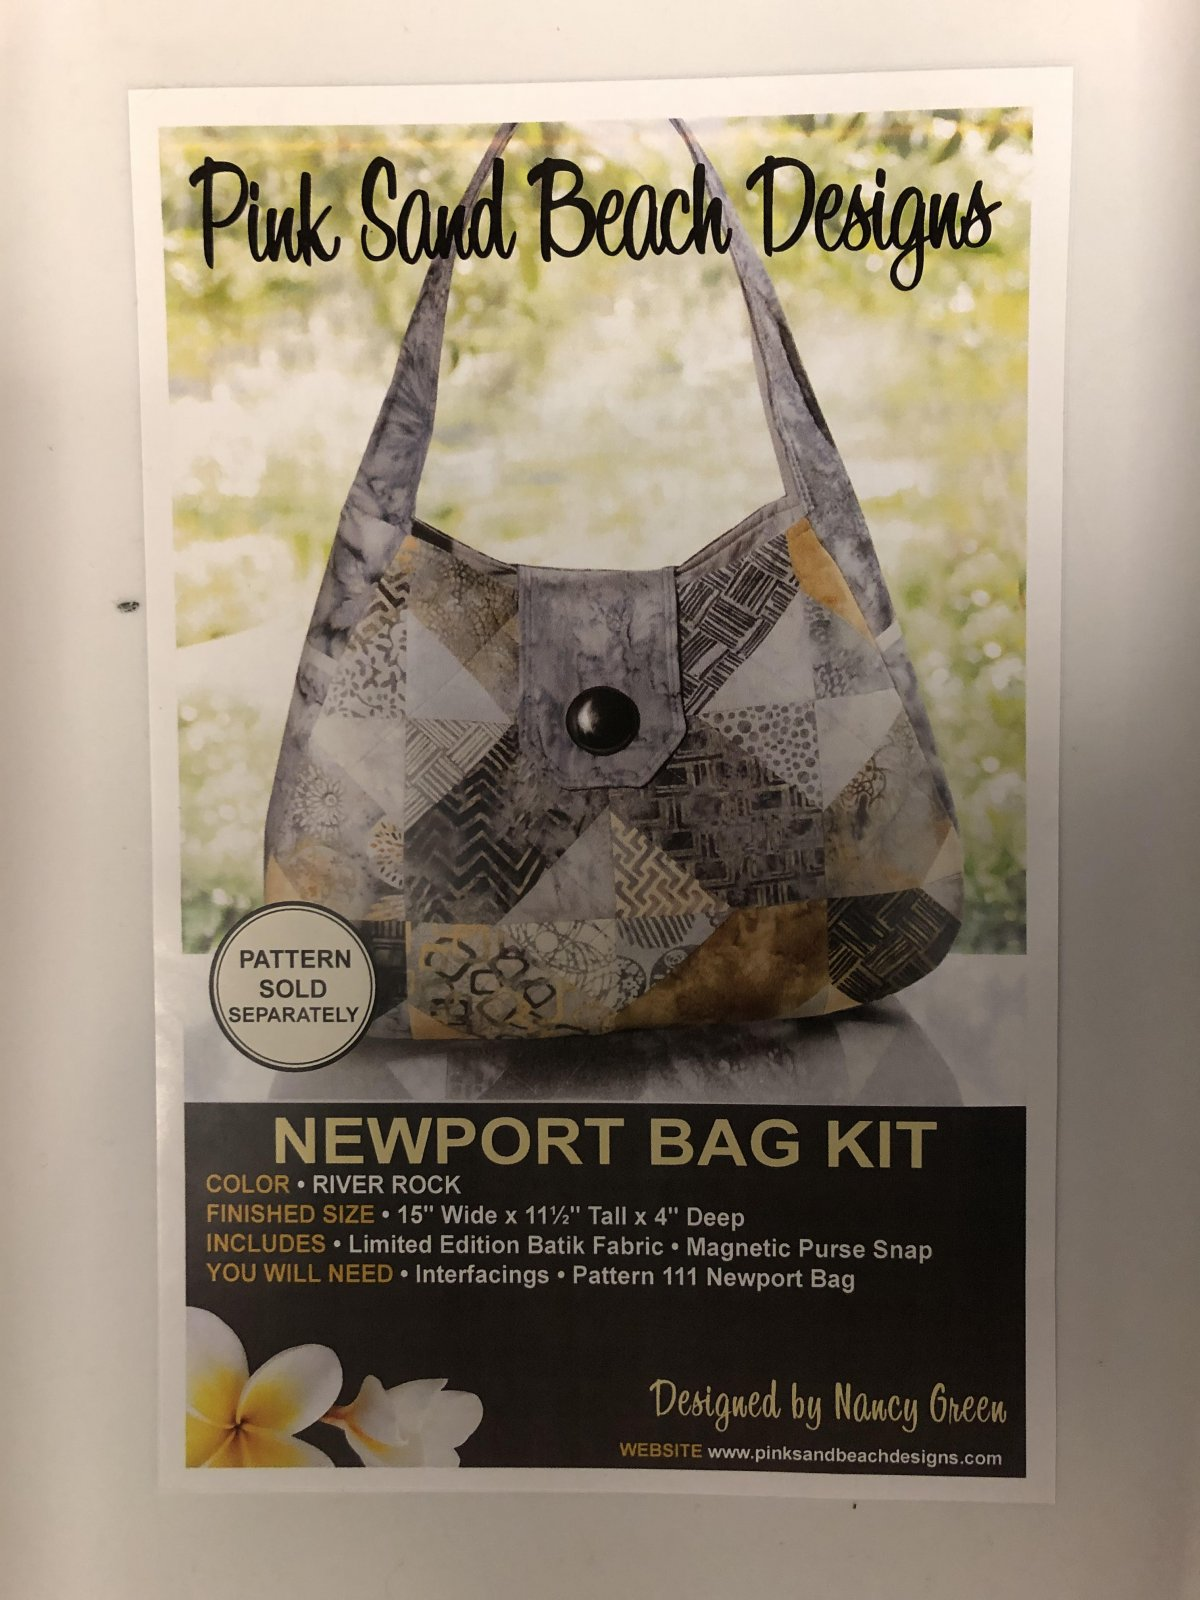 Newport Bag Kit 111 Pink Sand Beach Designs '